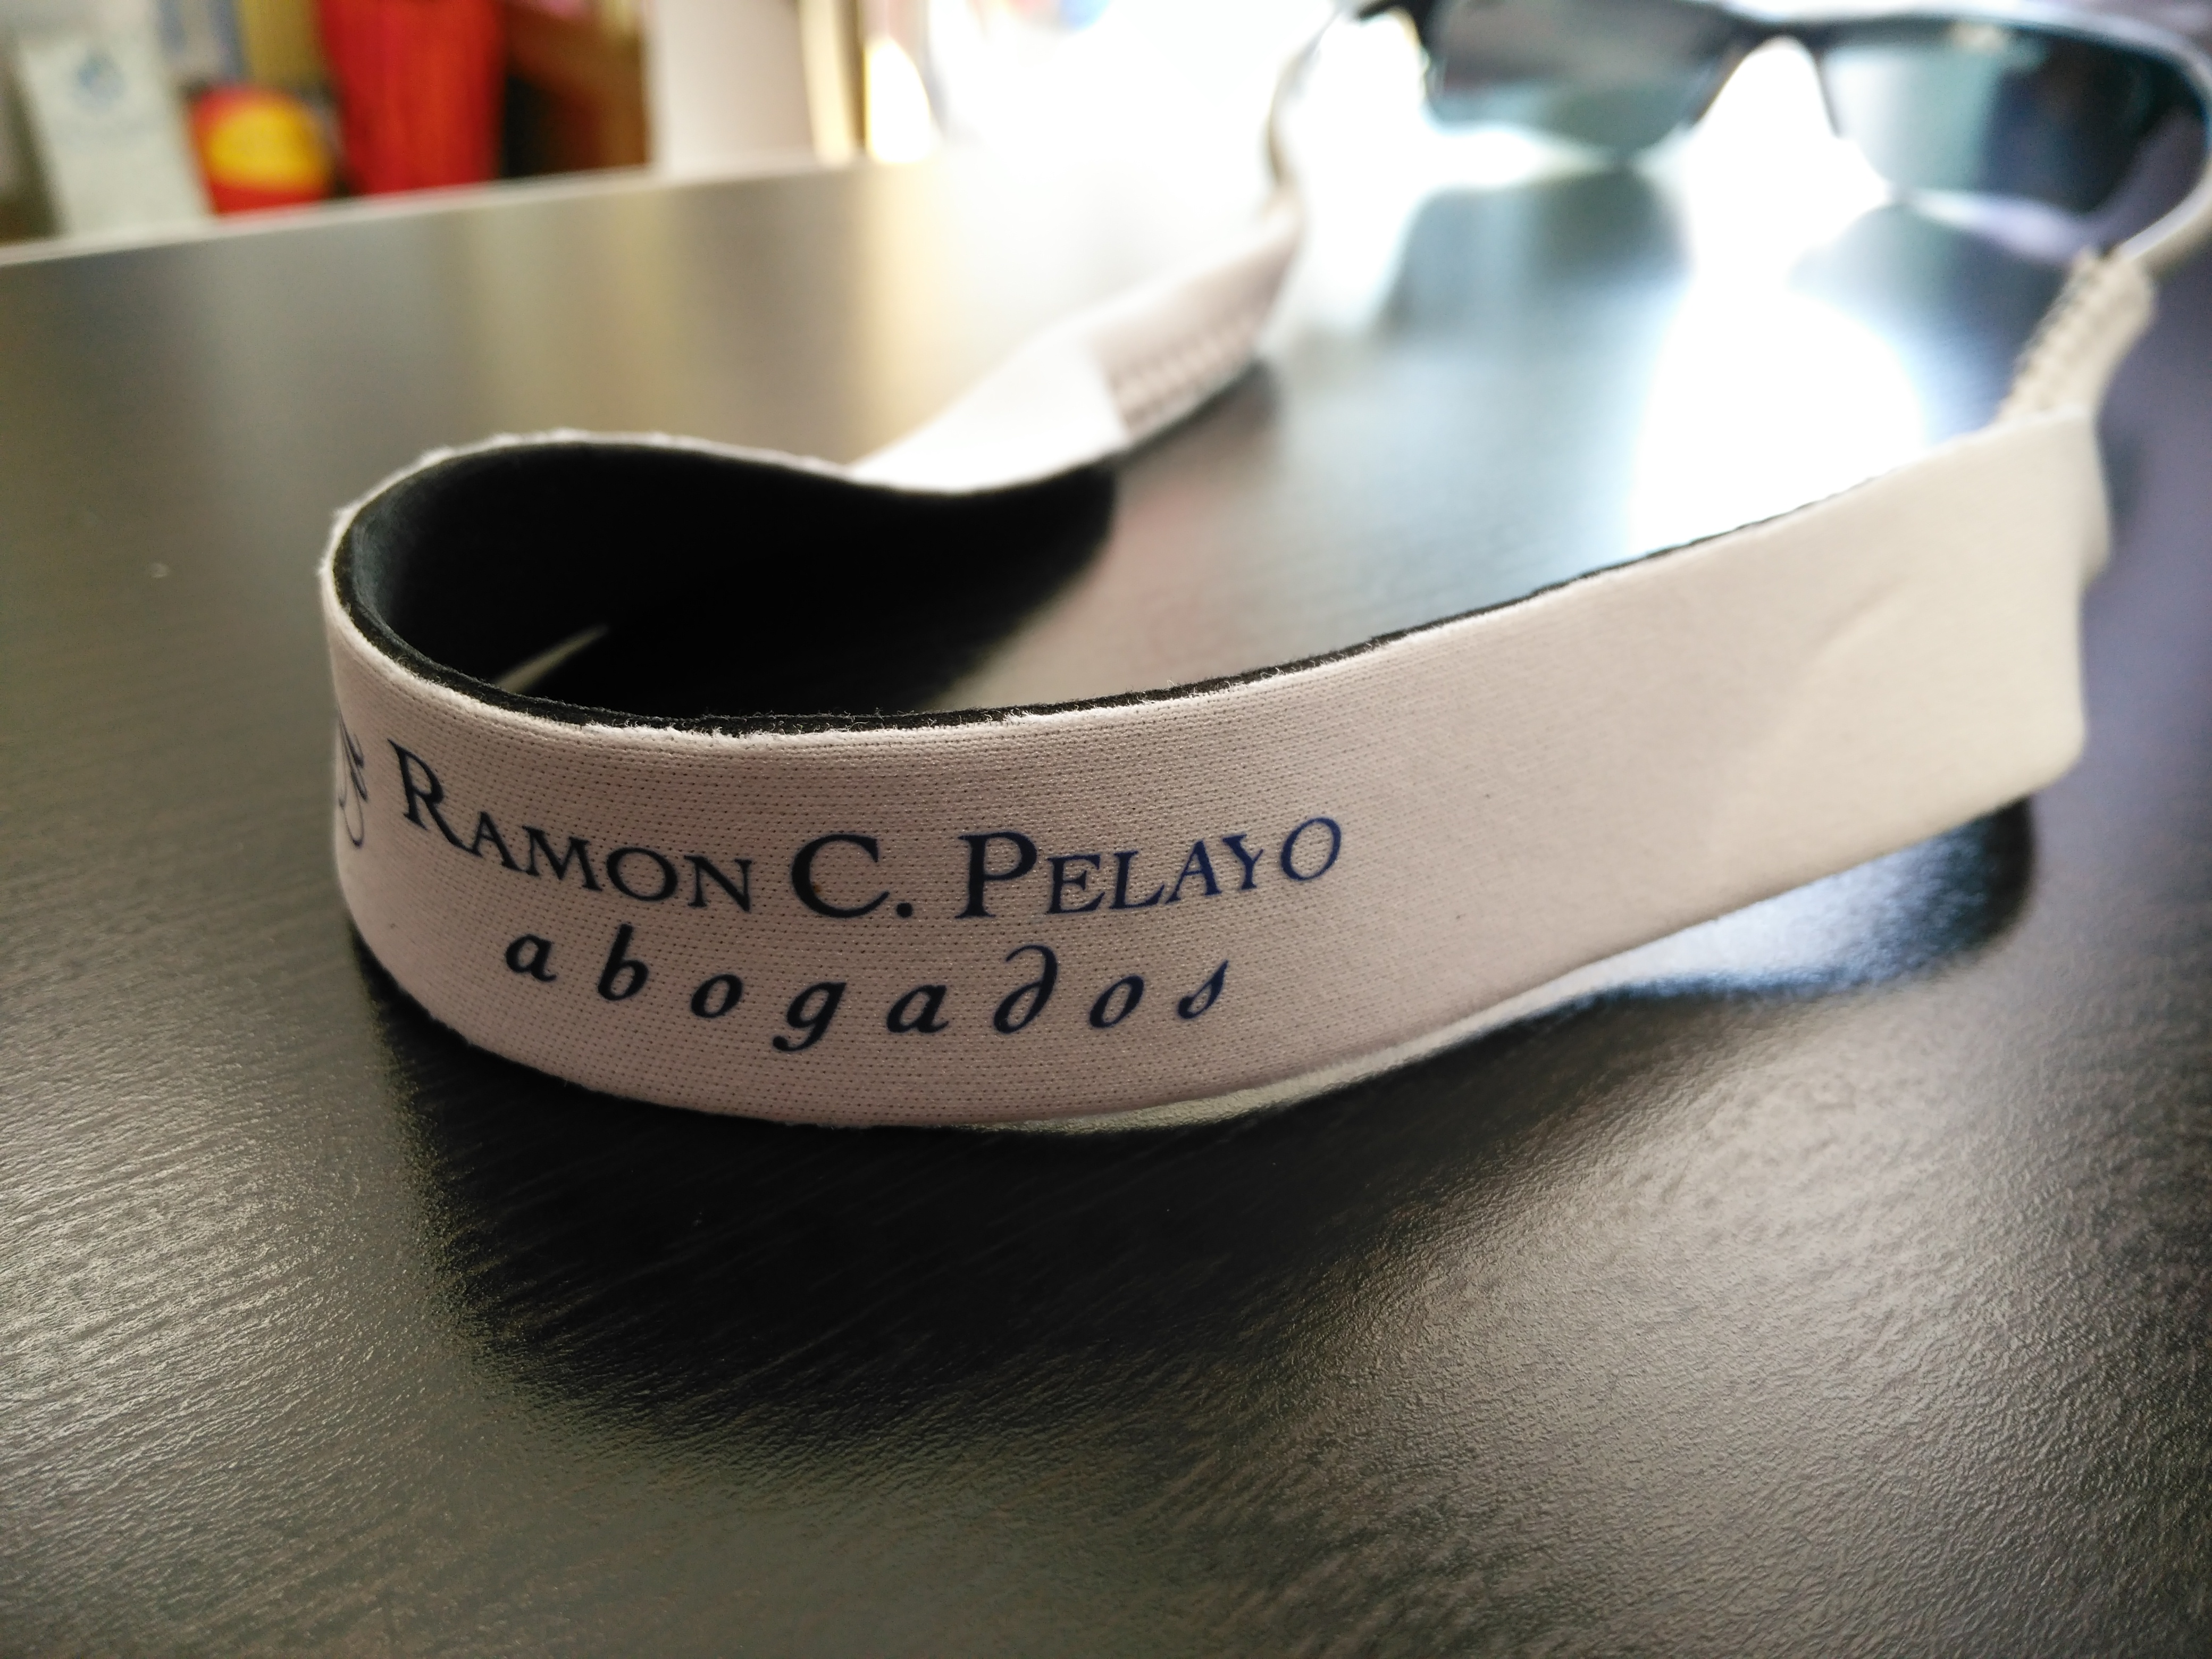 Pelayos Abogados Merchandising